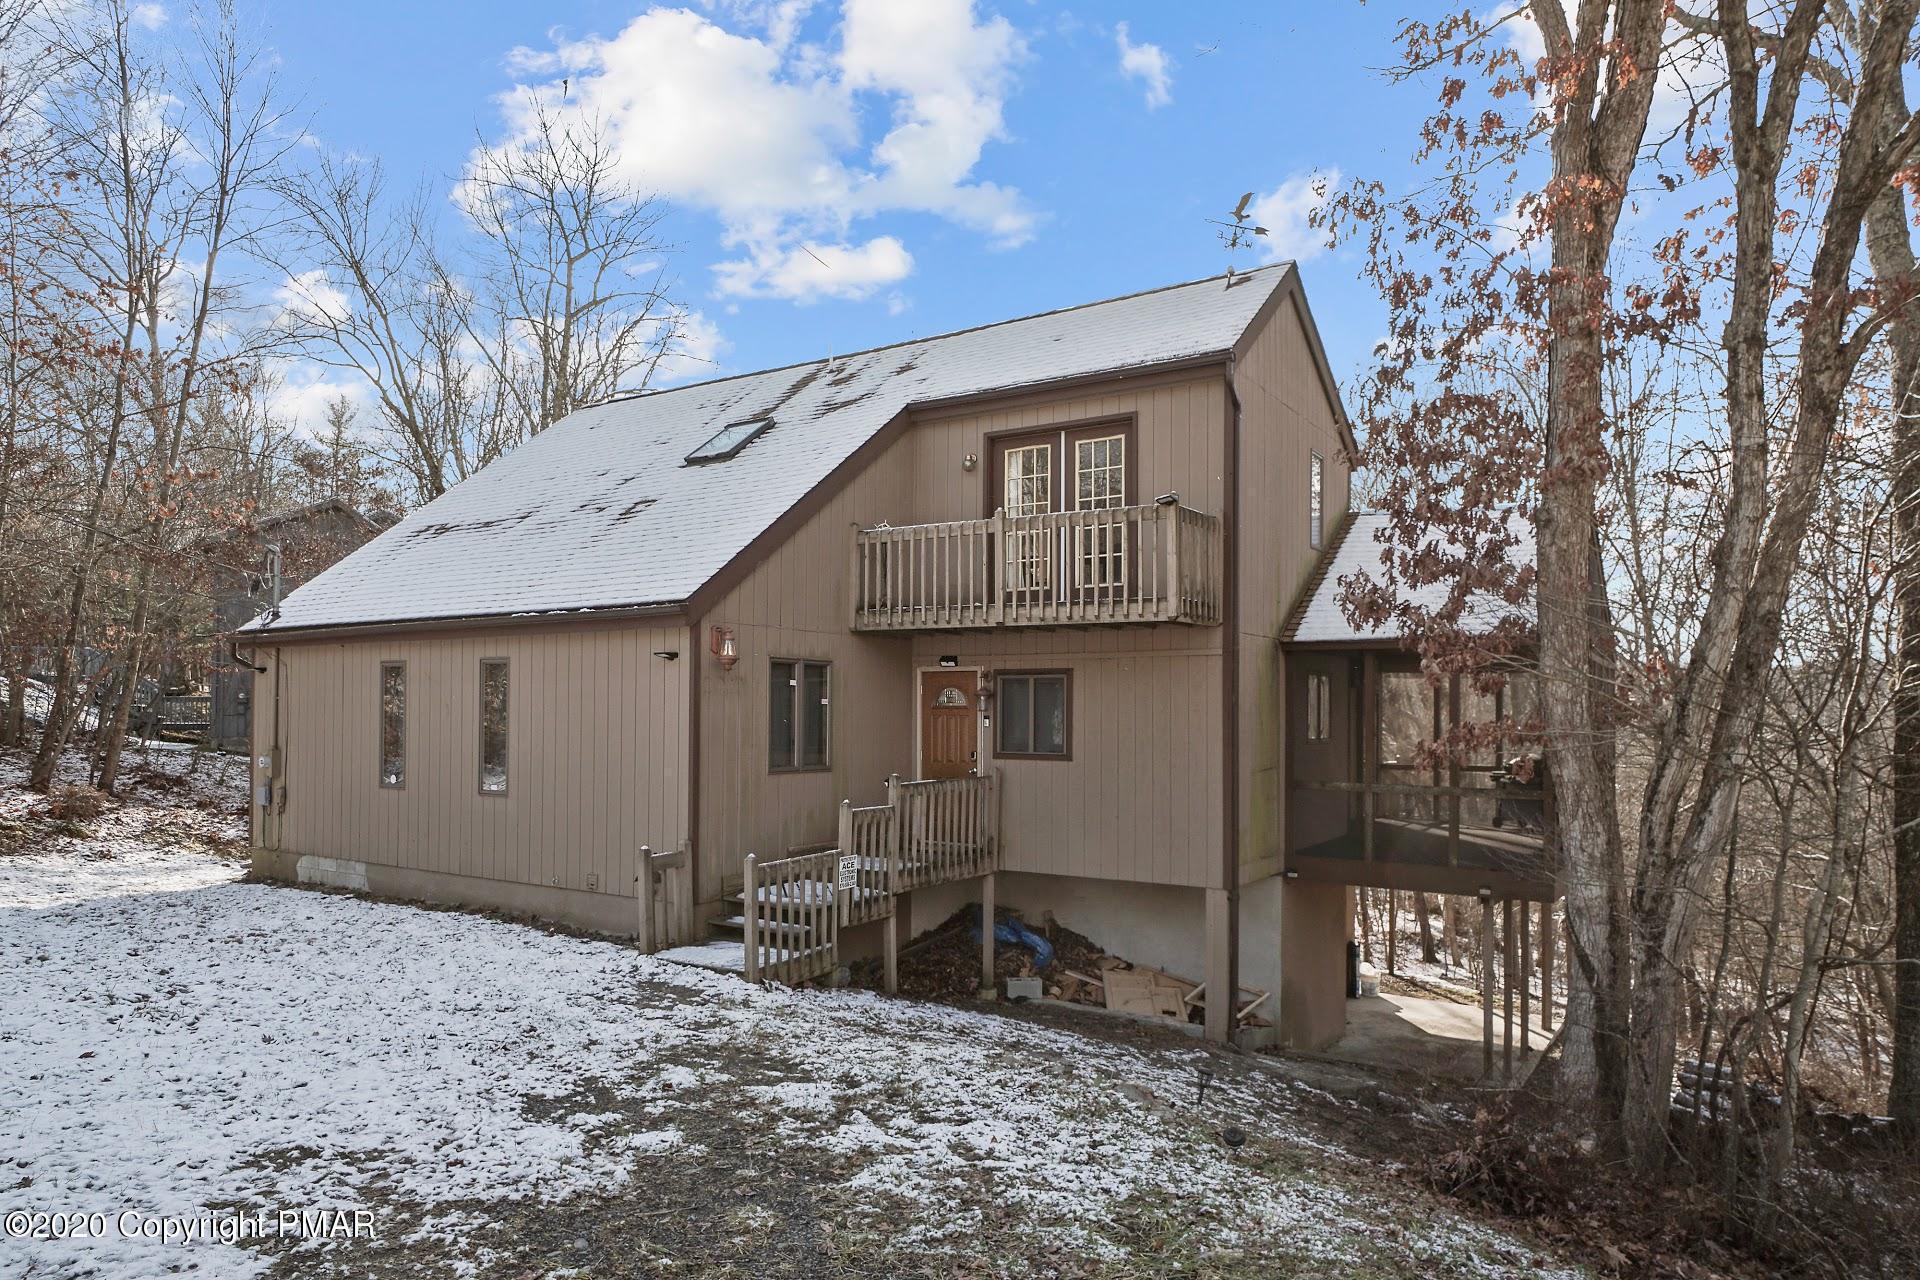 243 Brentwood Dr, Bushkill, PA 18324